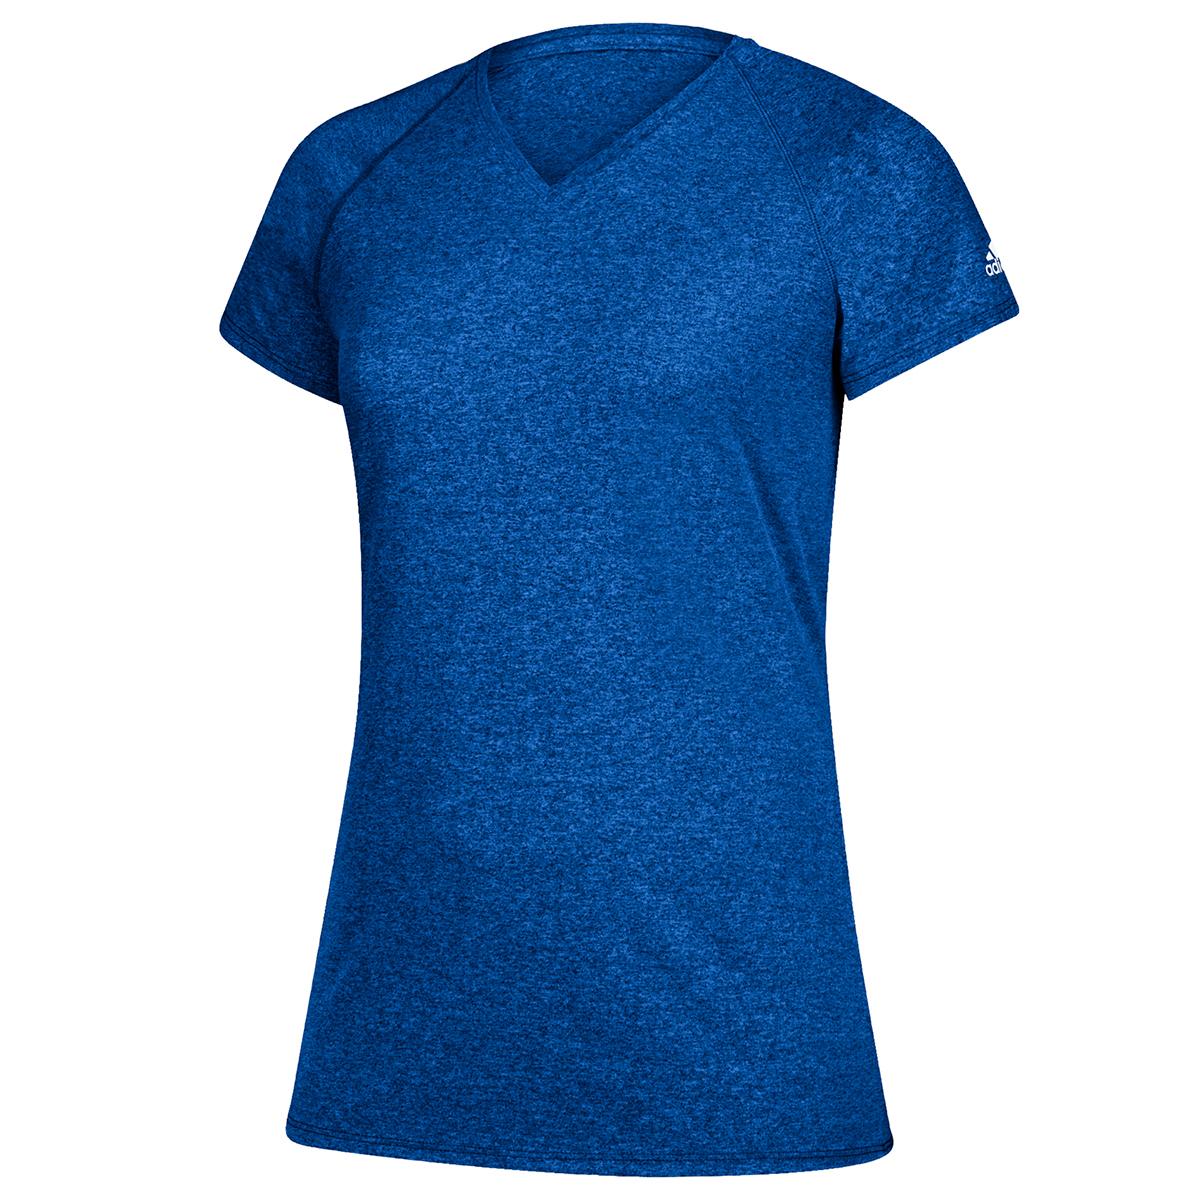 Adidas Women's Short-Sleeve Team Climalite Tee - Blue, 4XL